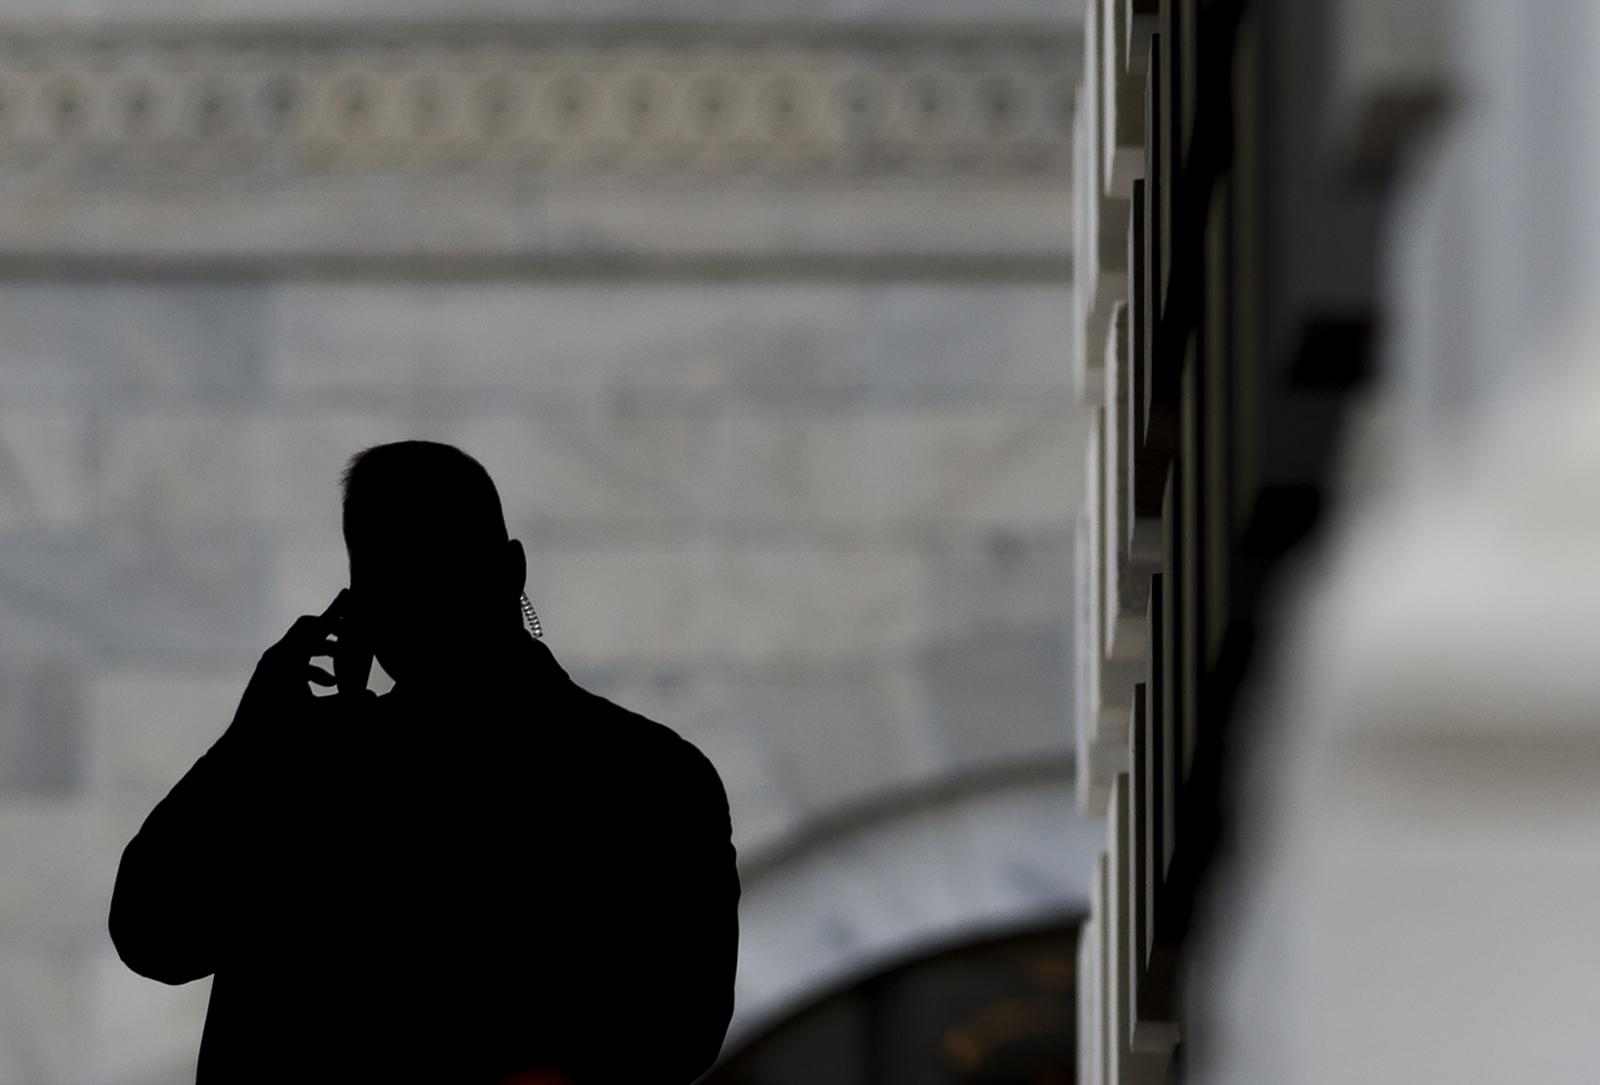 US Secret Service officials